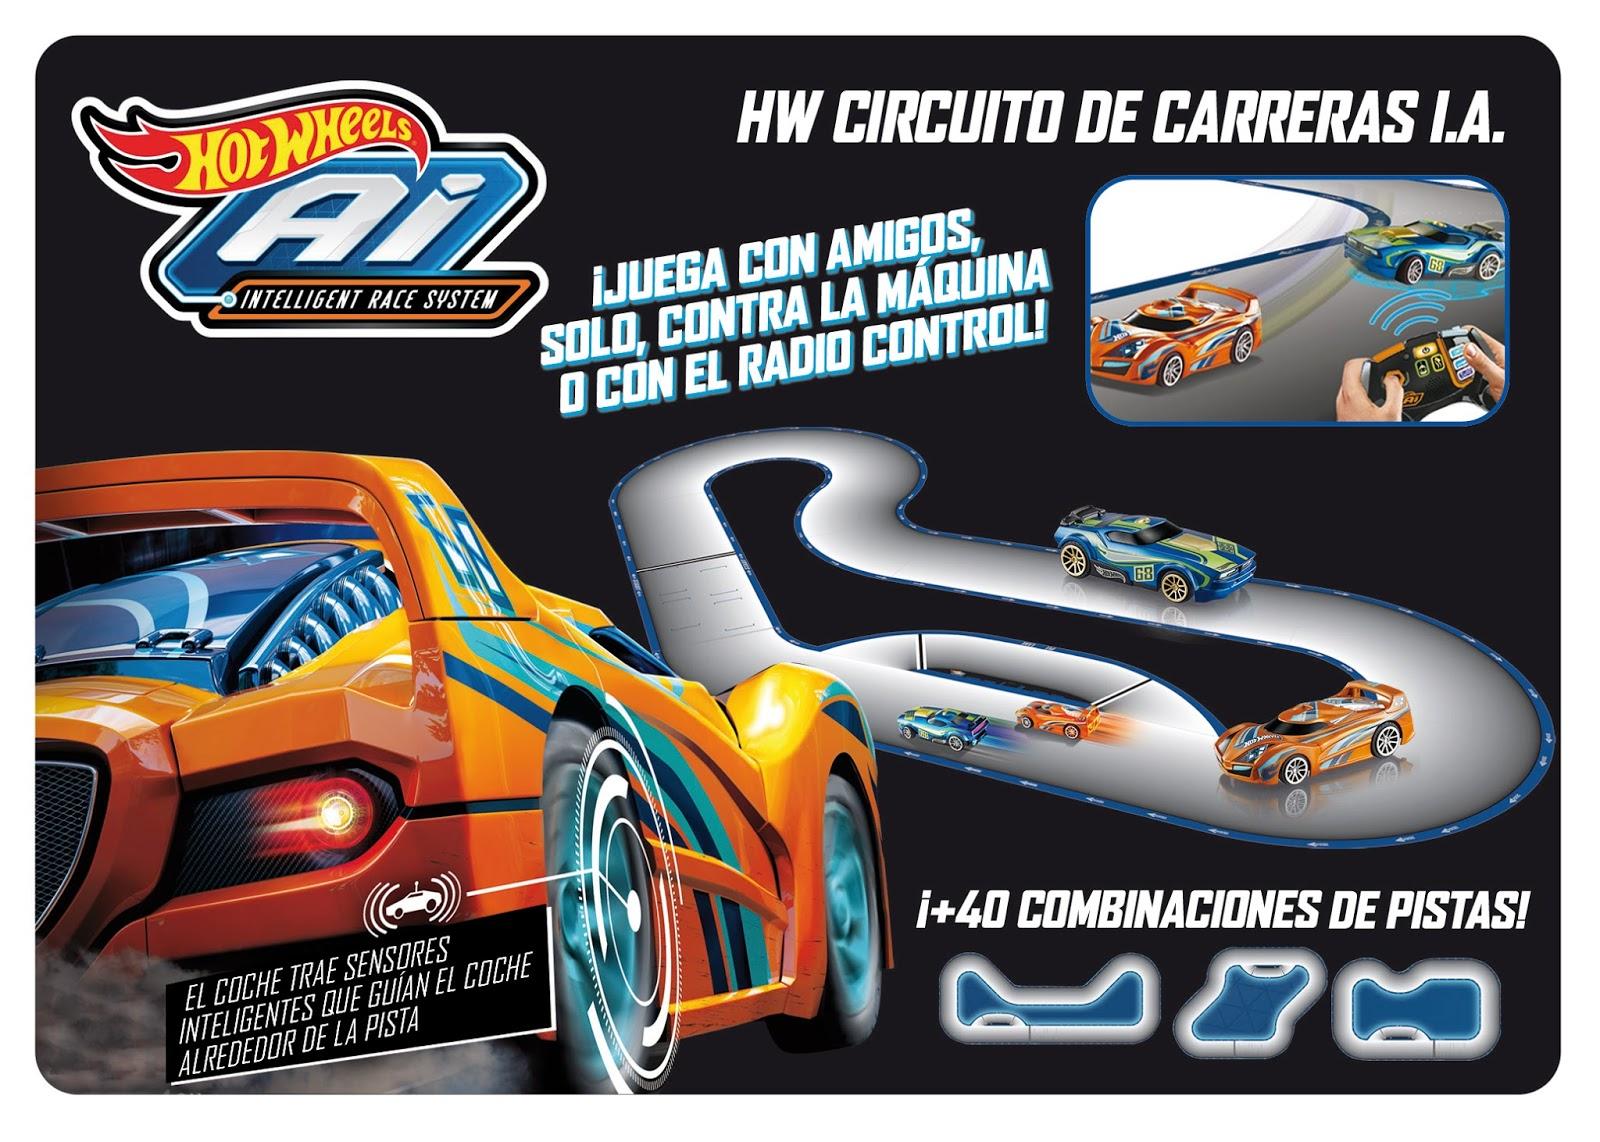 Circuito Hot Wheels : Los Ángeles de papi hot wheels circuito de carreras i a